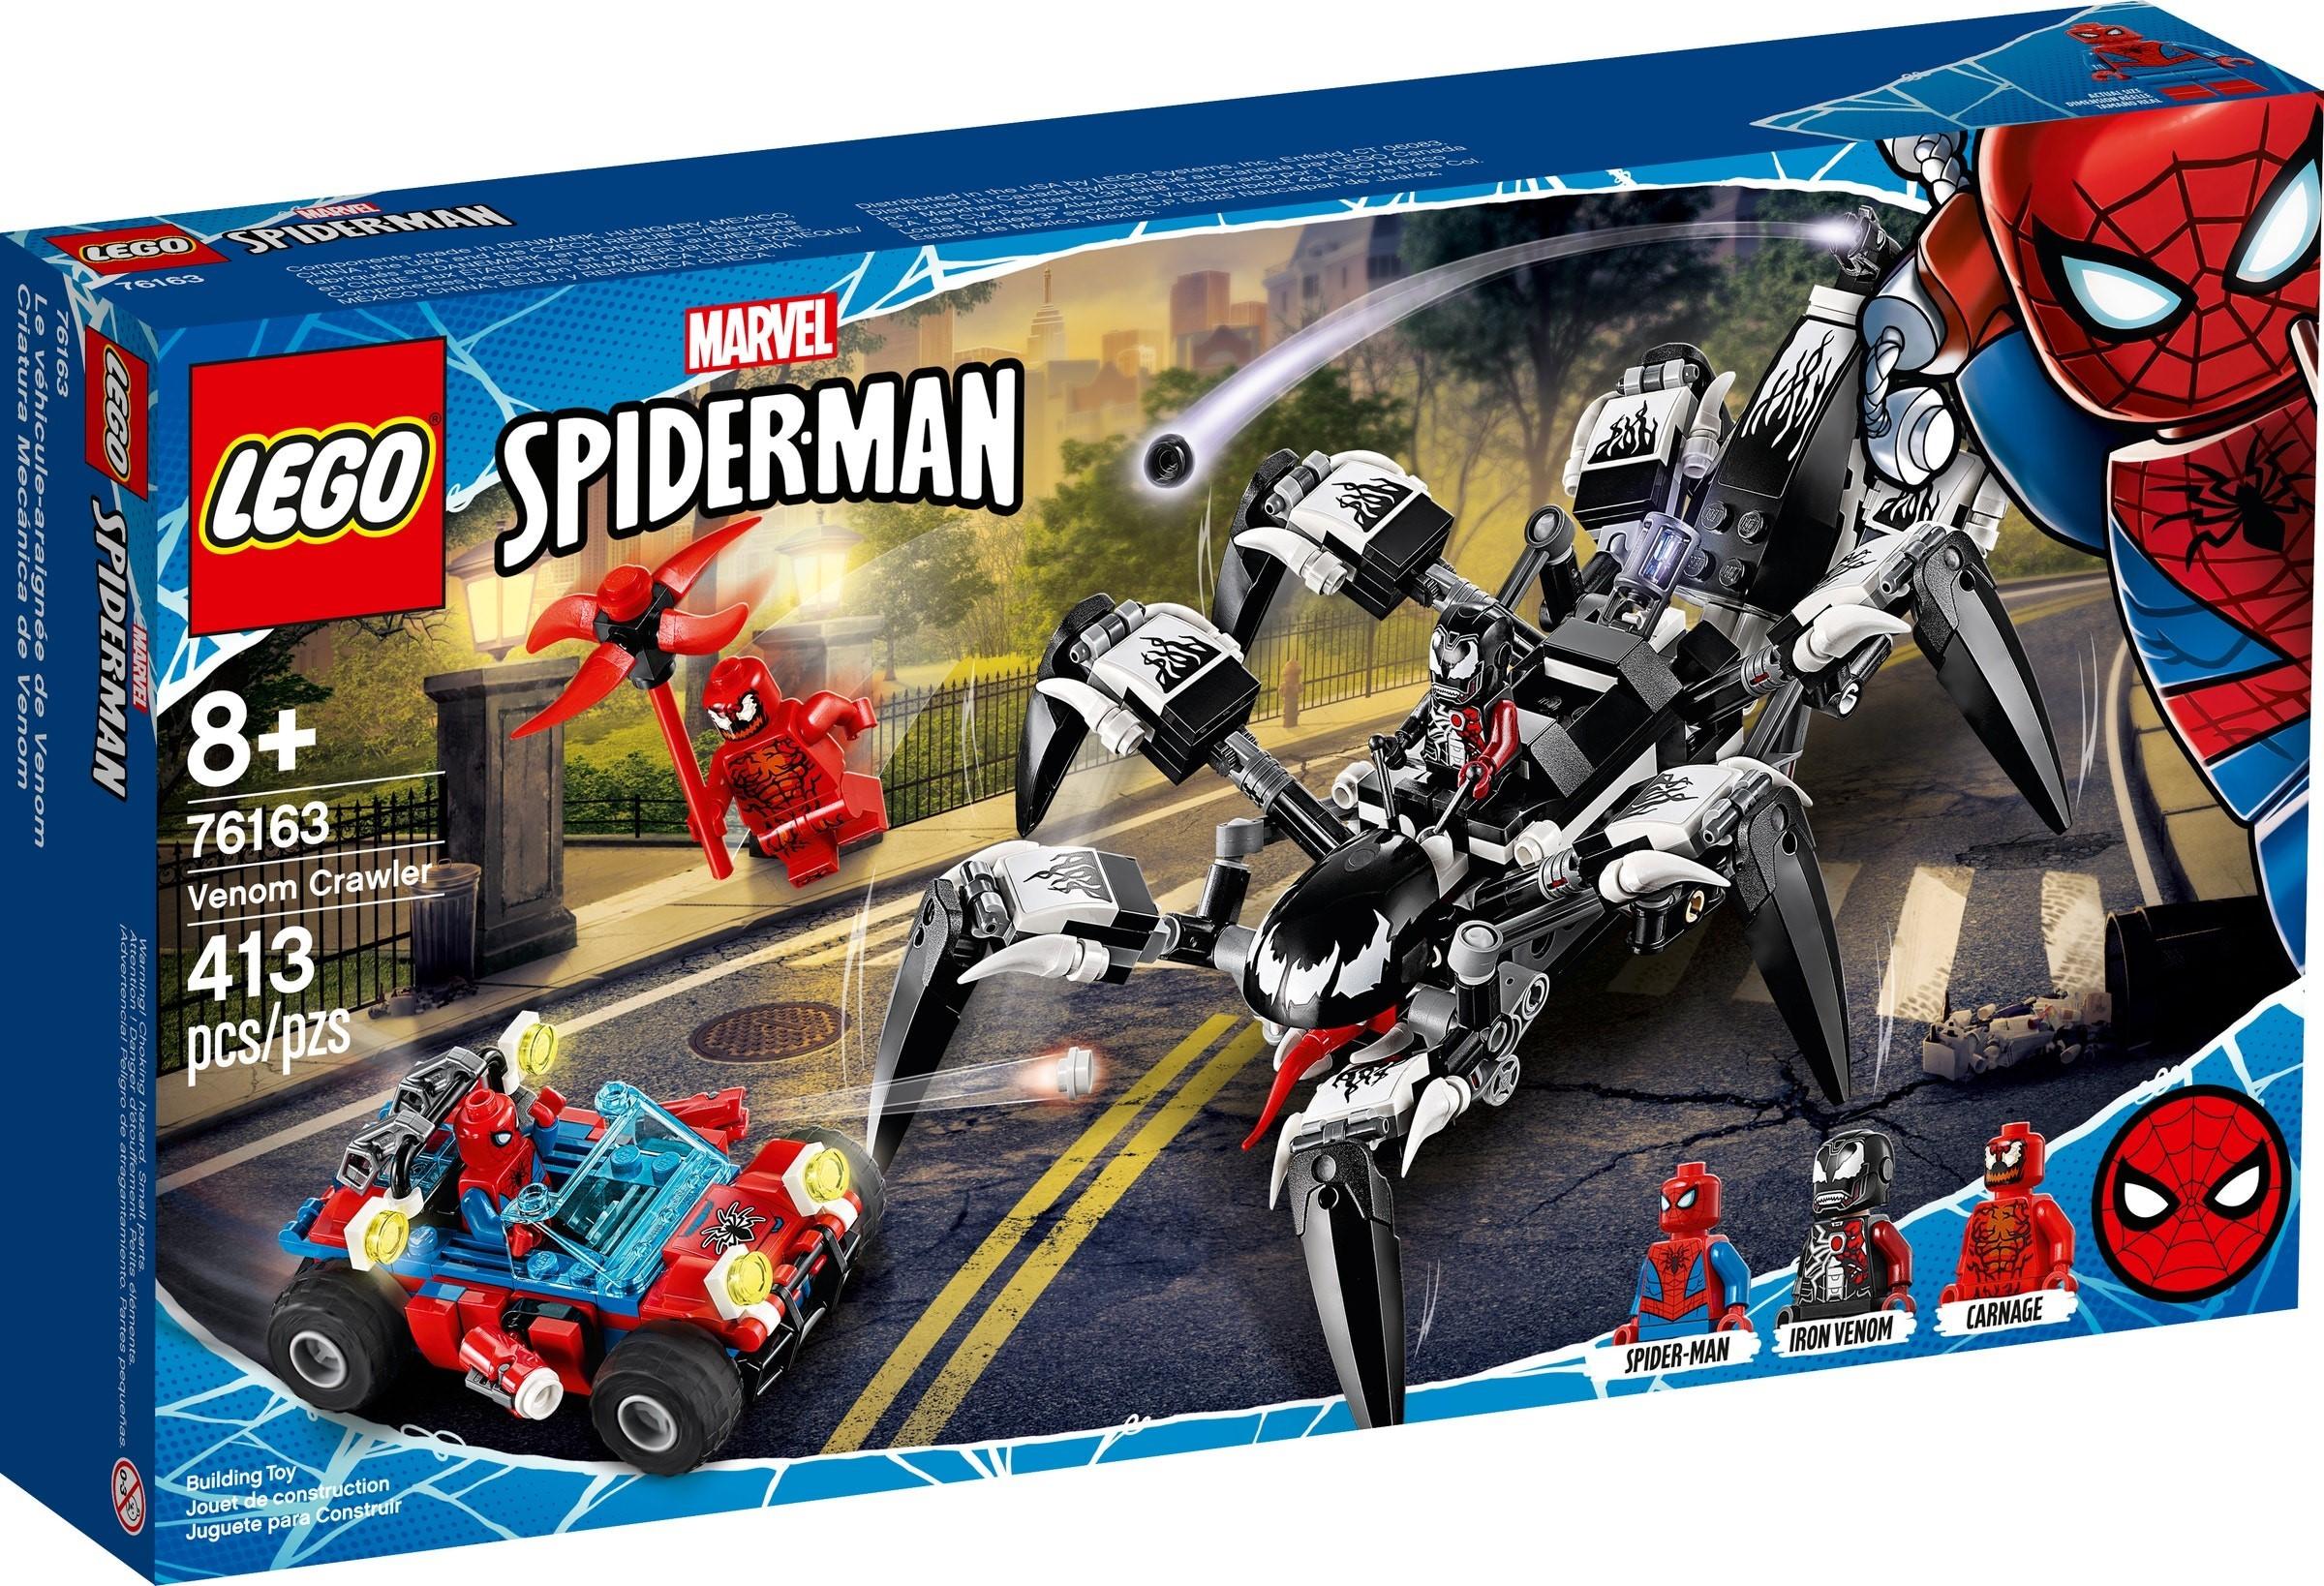 lego-marvel-spider-man-venom-crawler-76163-2020-box zusammengebaut.com